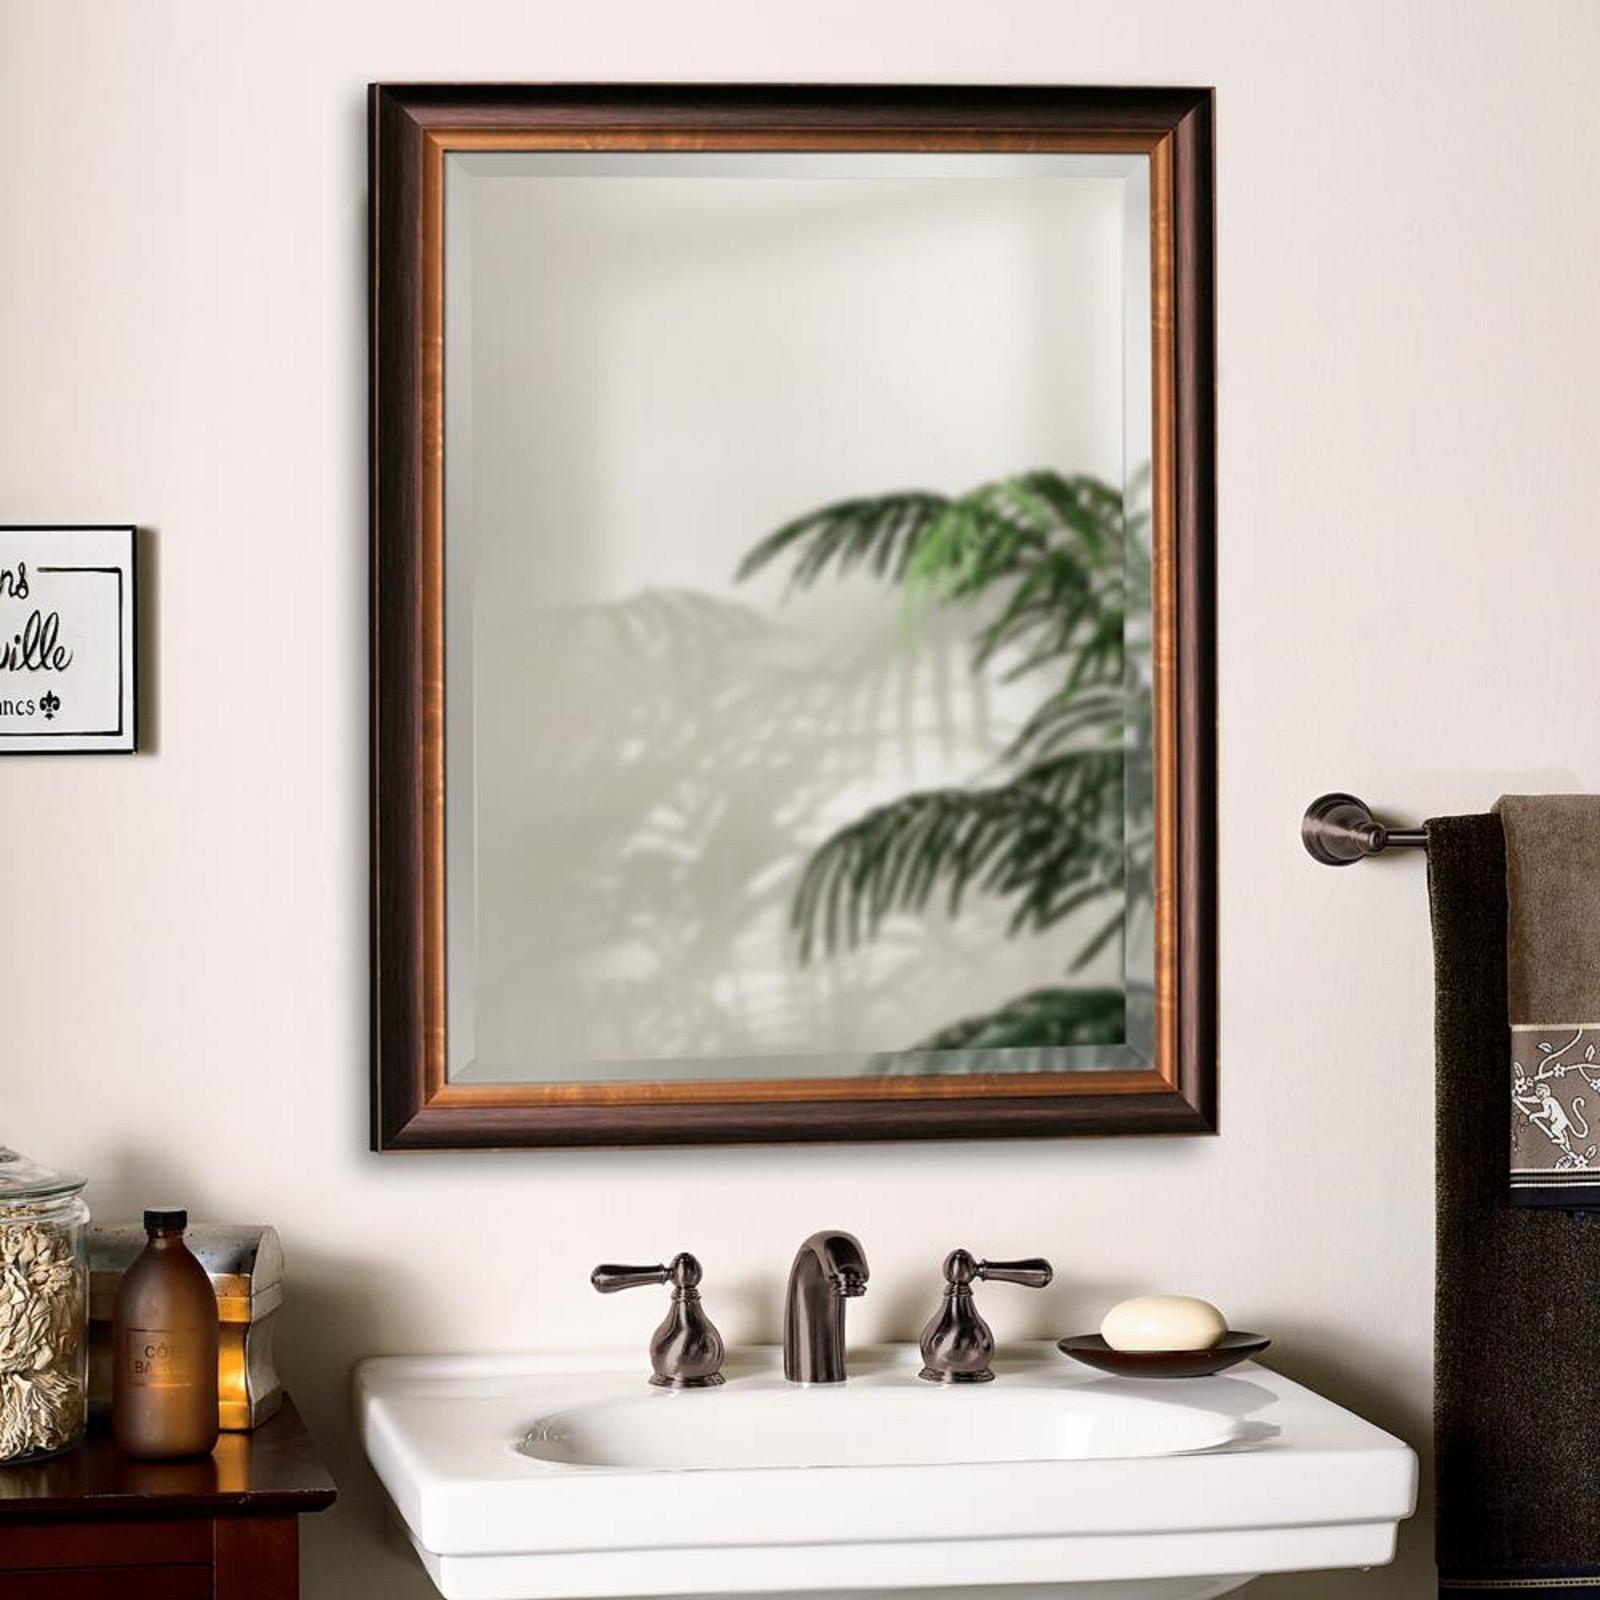 Bathroom Vanity Mirror 32 Inch X 26 Inch Oil Rubbed Bronze